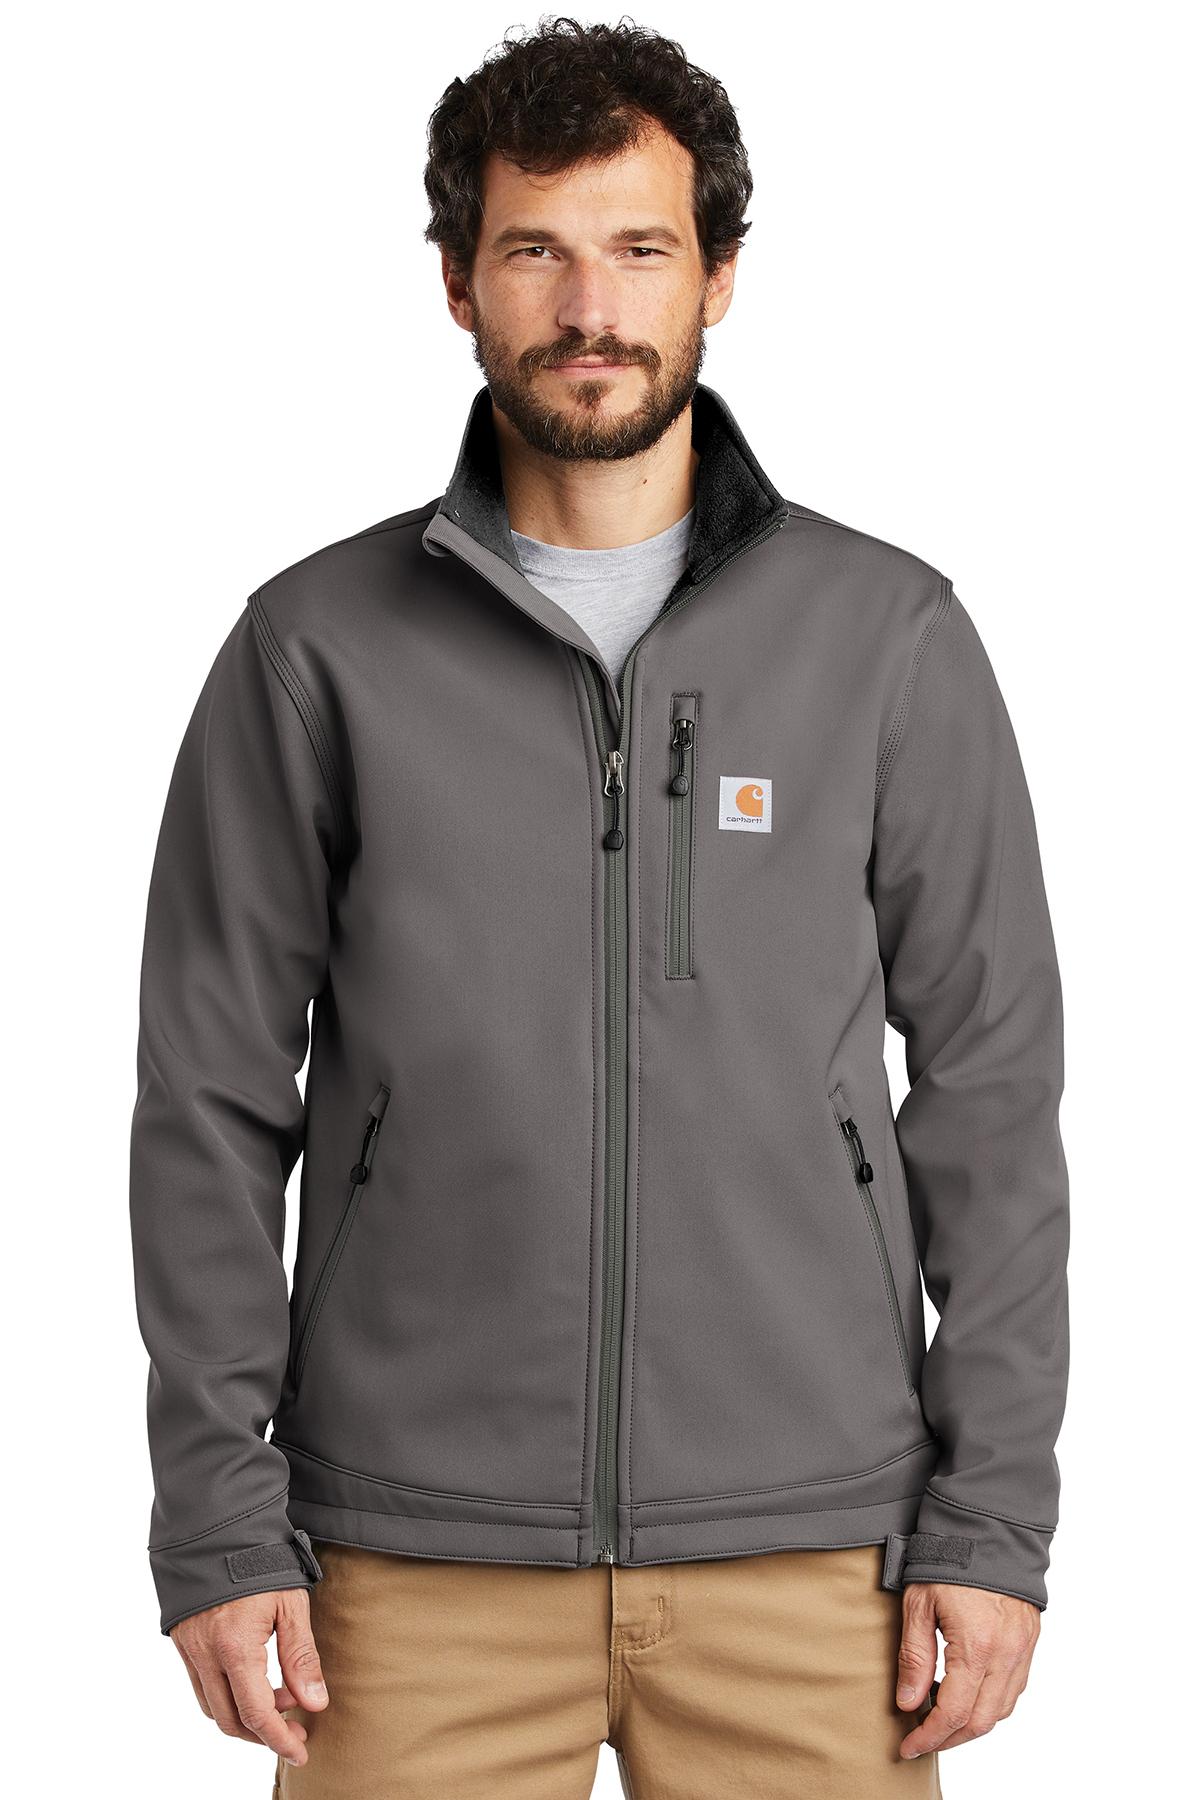 Carhartt CT102199 - Crowley Soft Shell Jacket